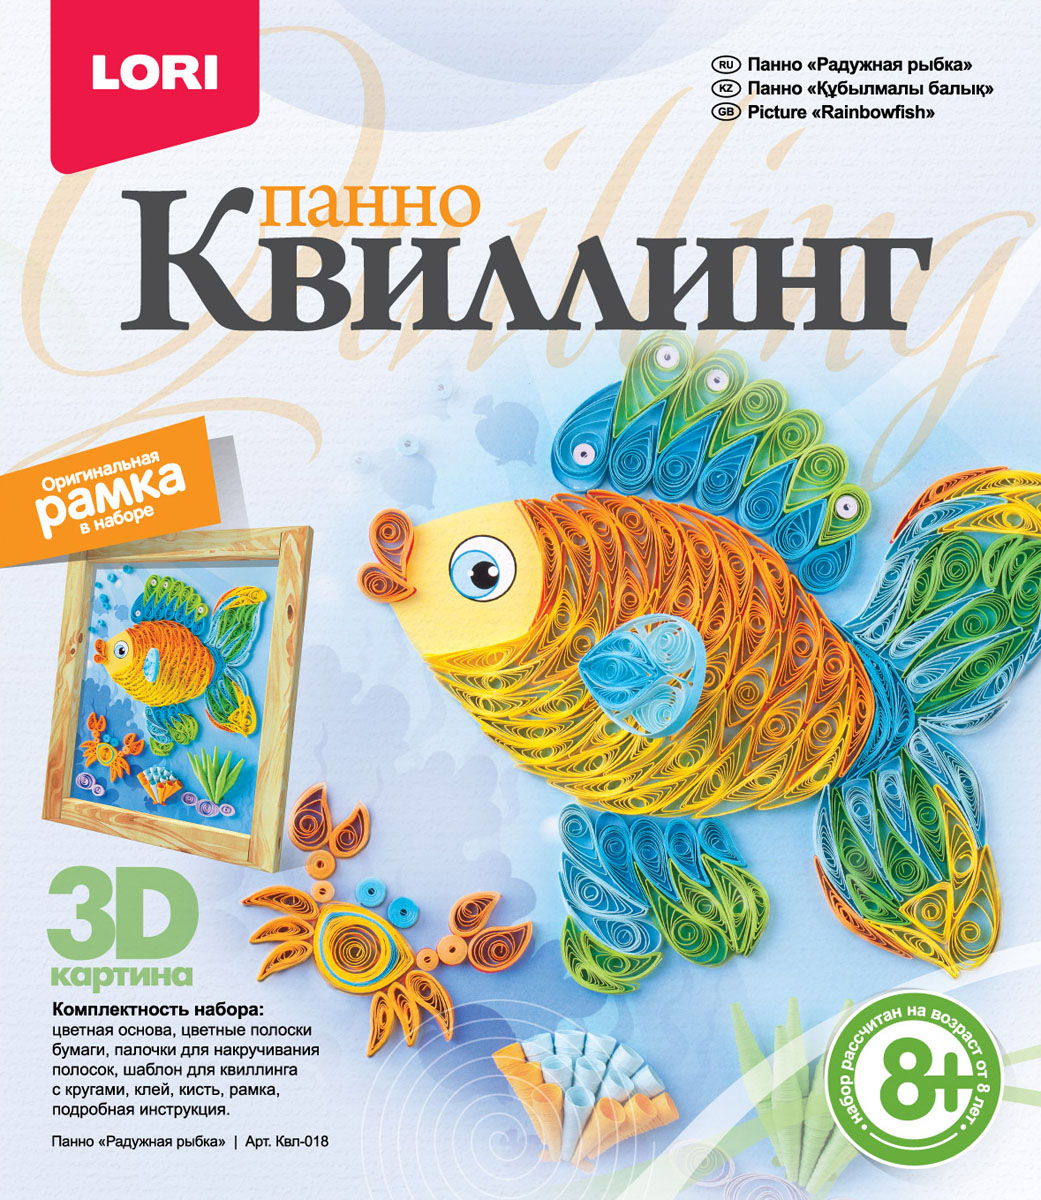 Lori Набор для квиллинга Панно Радужная рыбка lori квиллинг панно радужная рыбка